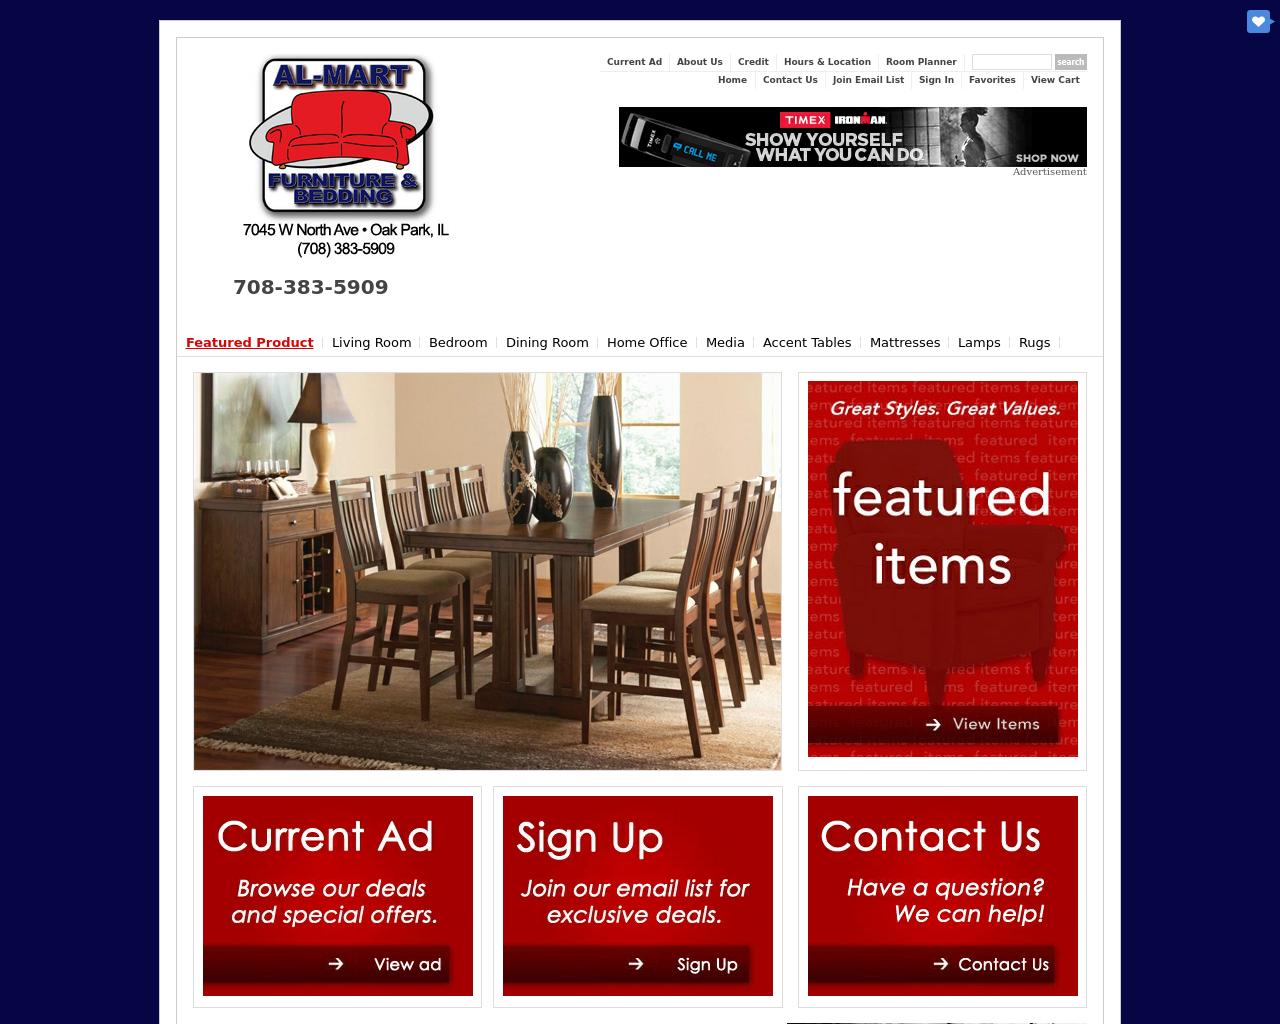 Al-Mart-Furniture-Advertising-Reviews-Pricing